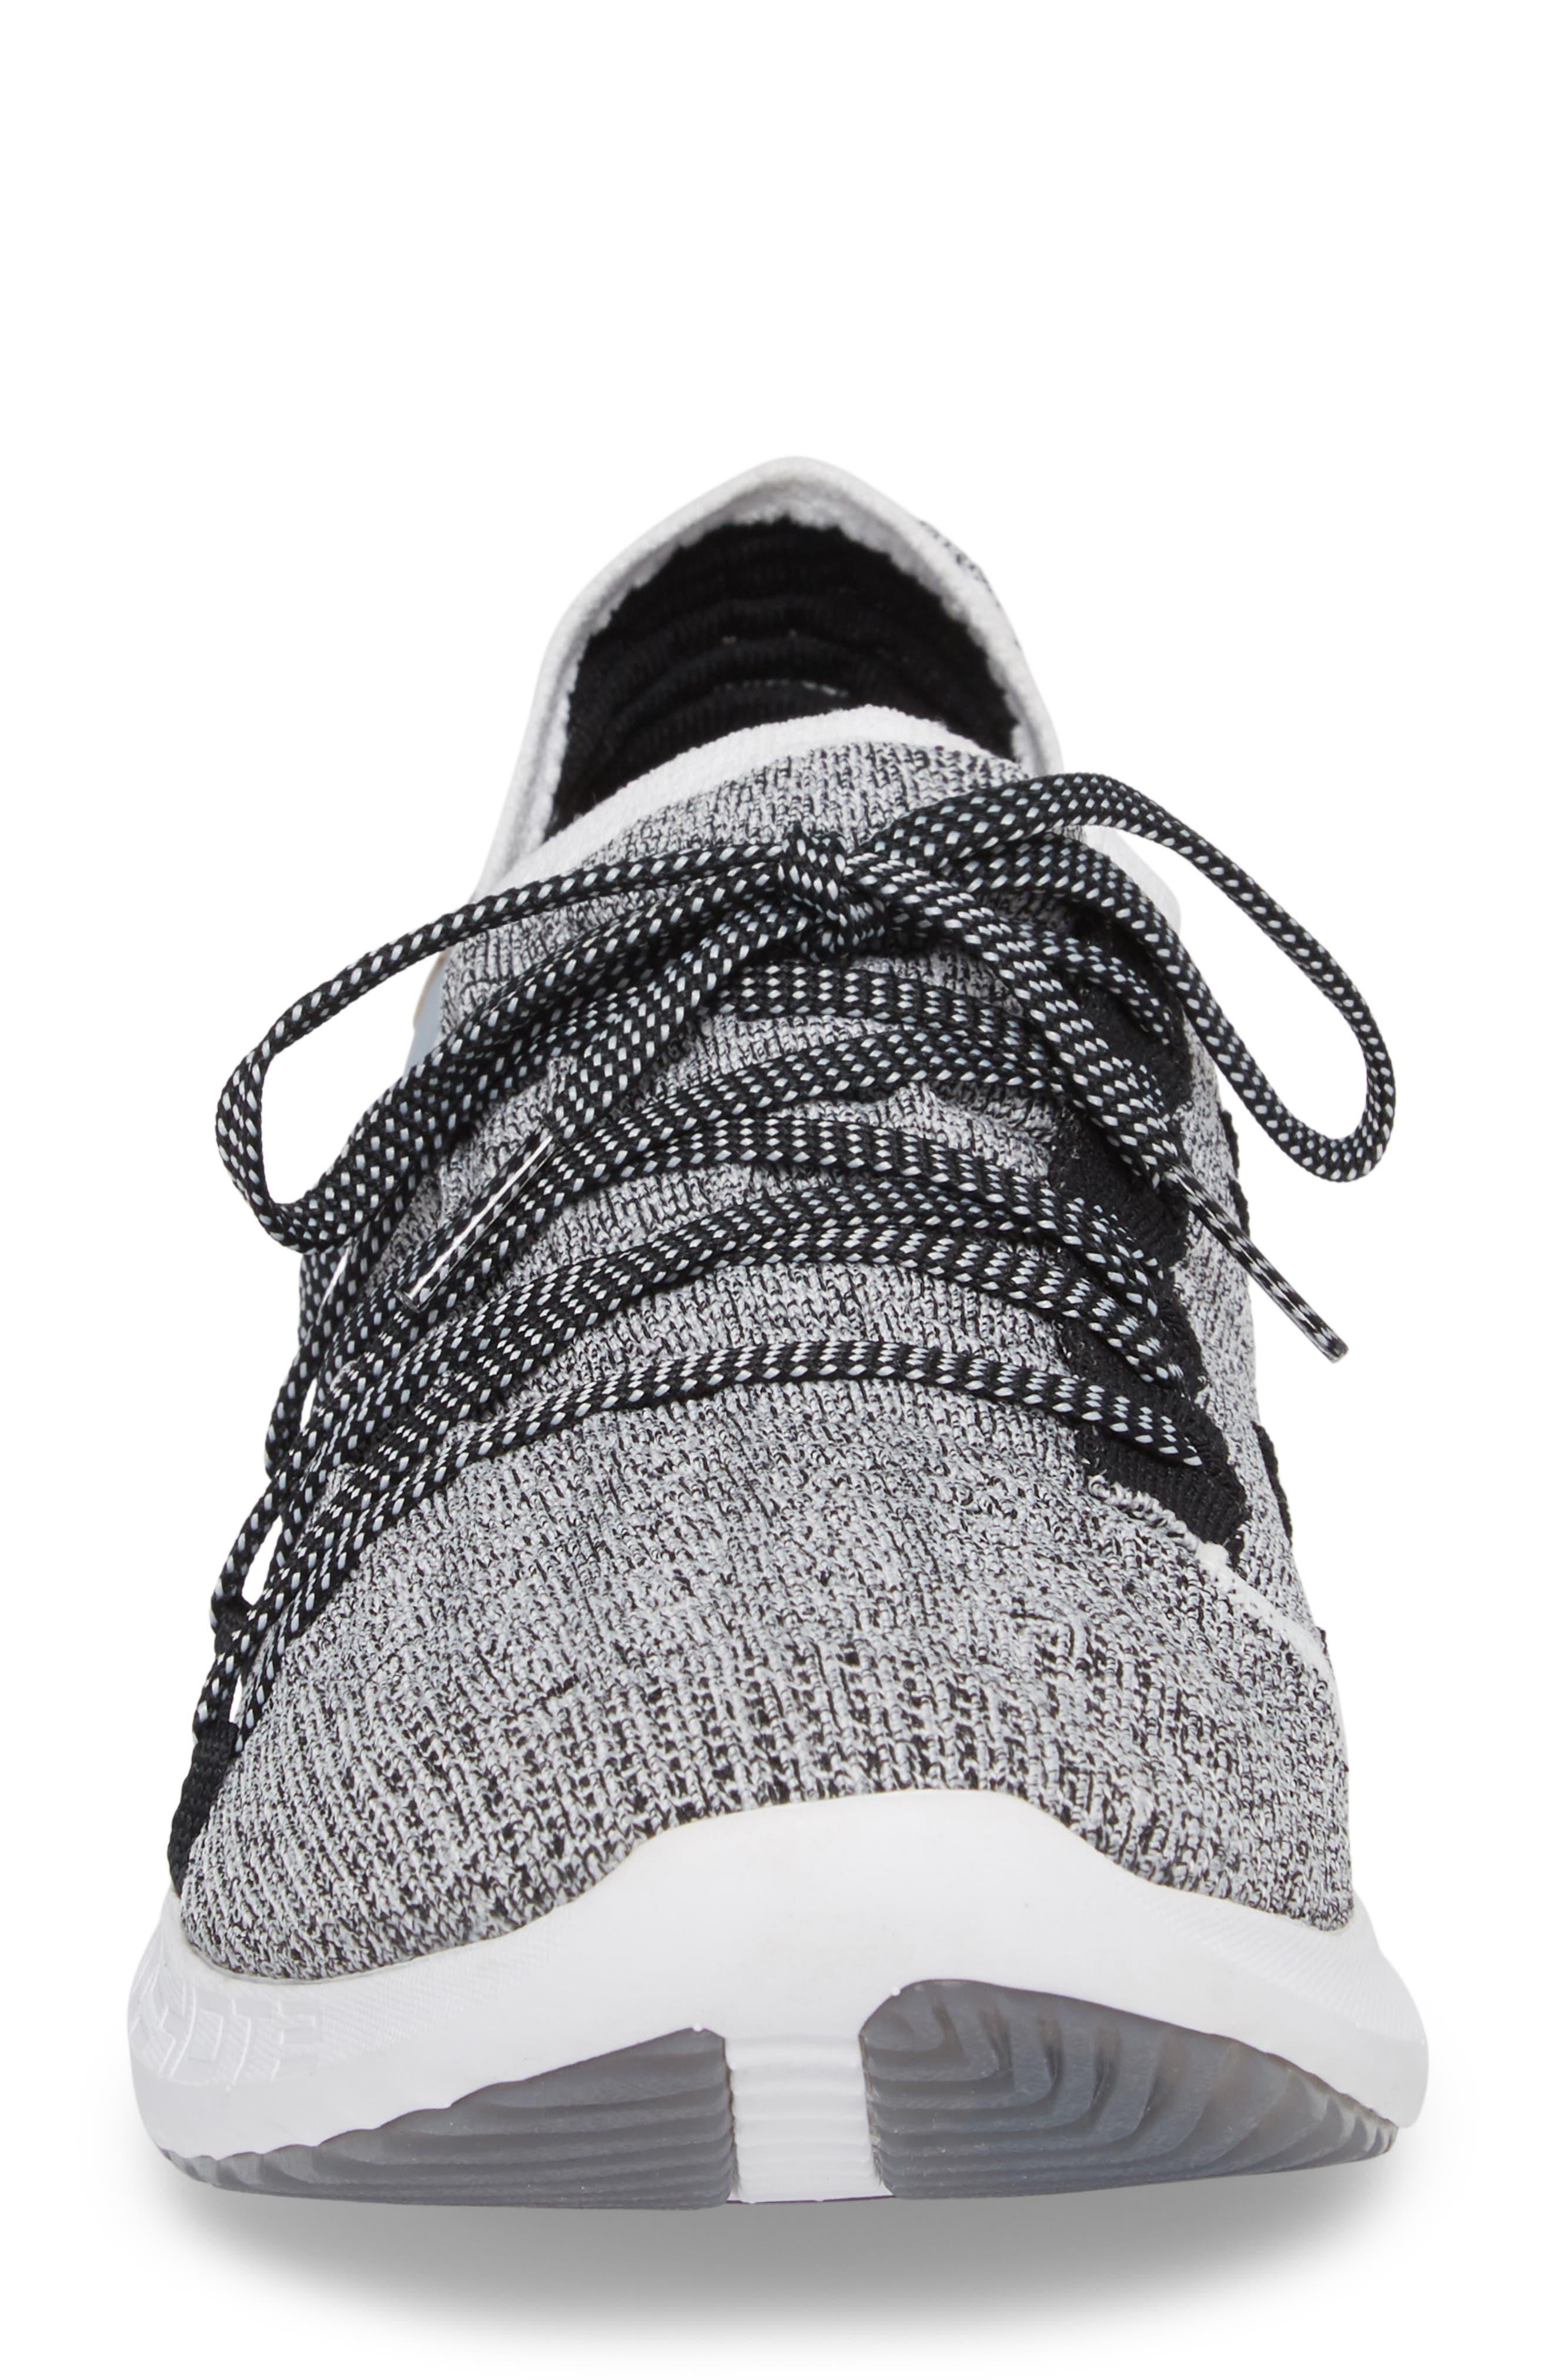 Speedform<sup>®</sup> Slingshot 2 Sneaker,                             Alternate thumbnail 4, color,                             White / Black / Metallic Gold